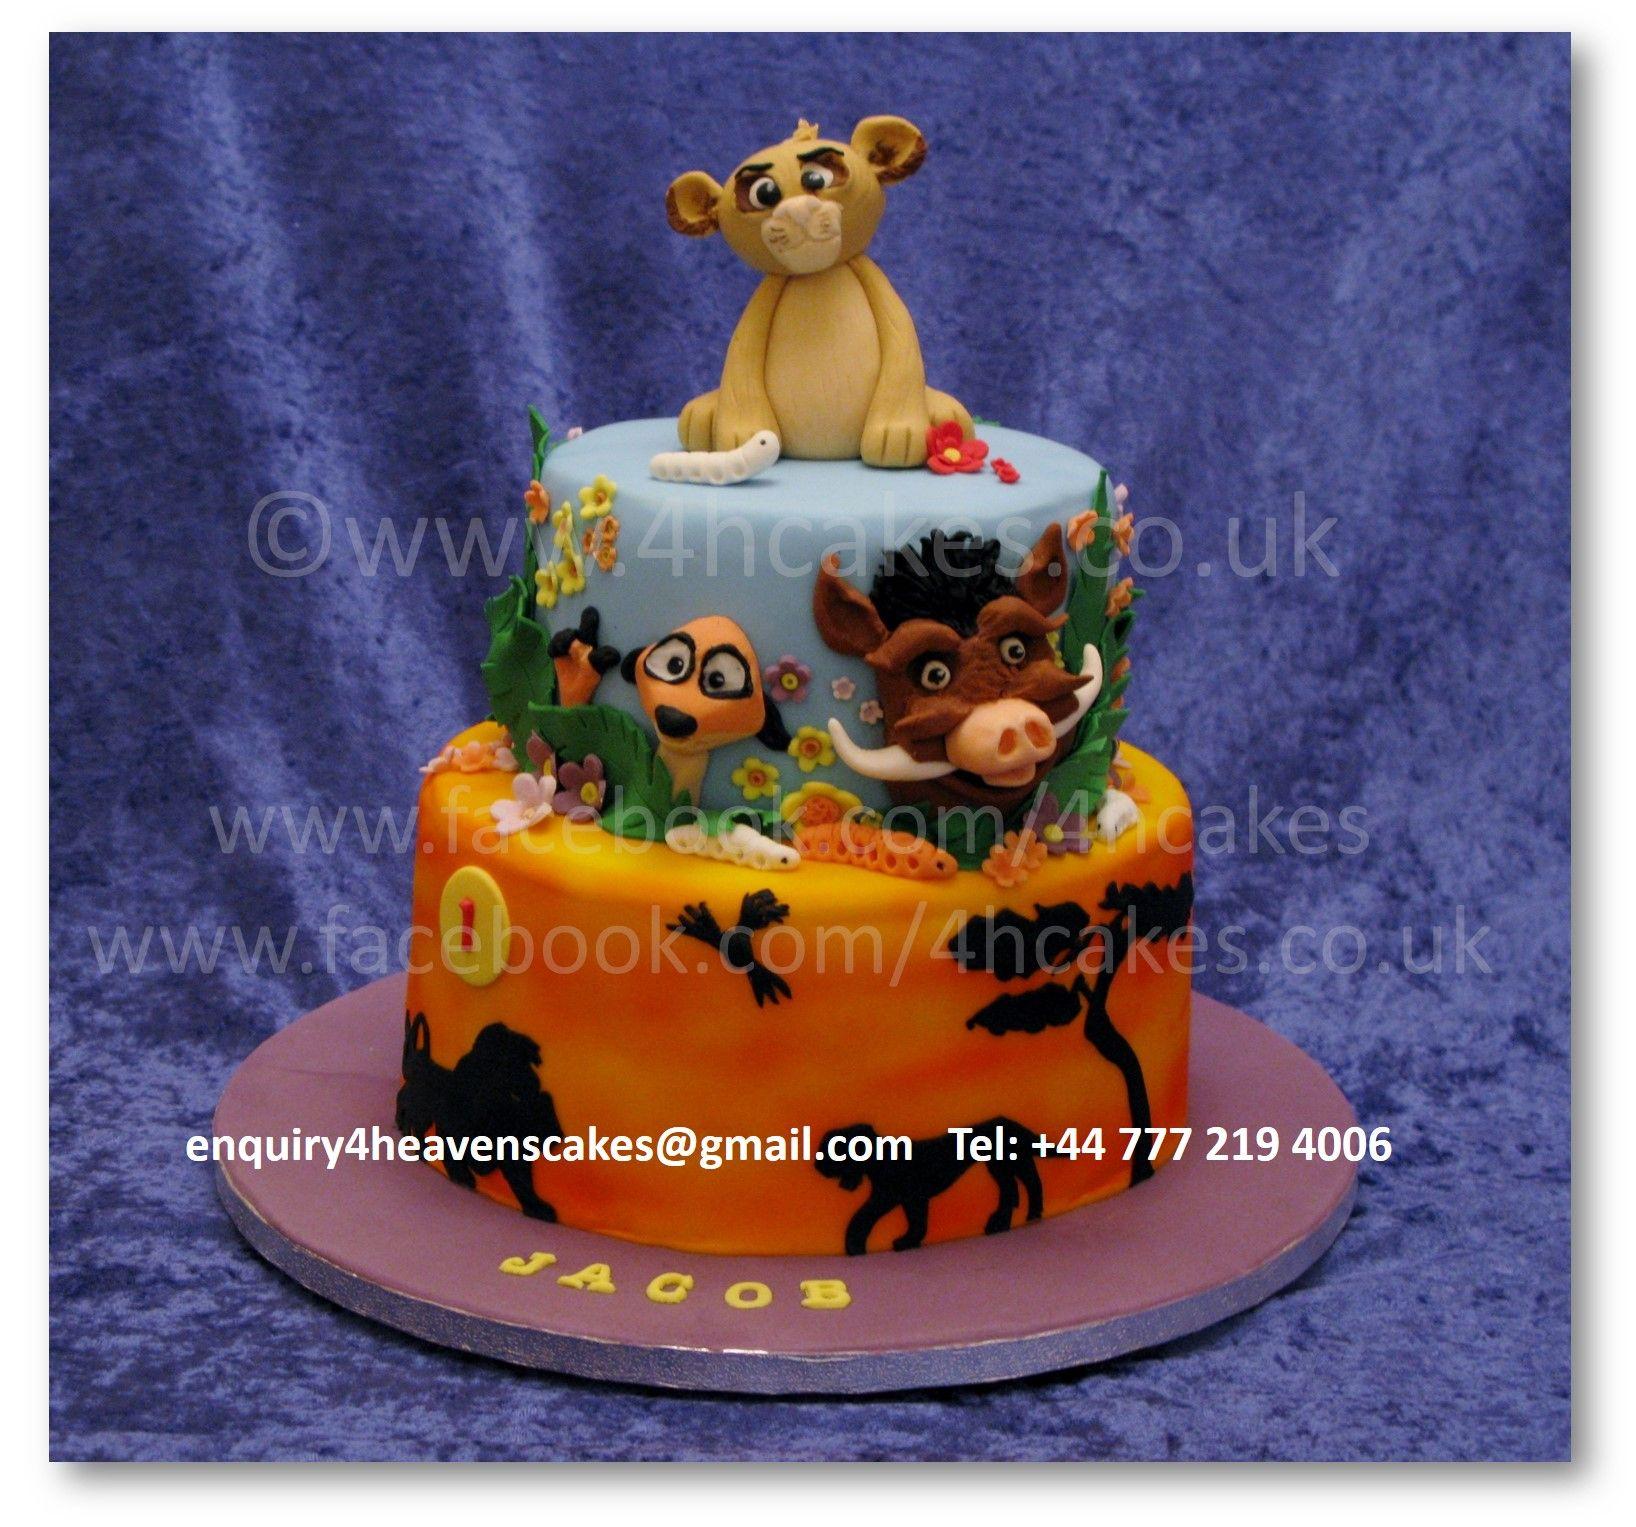 For Heavens Cakes 4hcakes Scotland Lion King Themed birthday